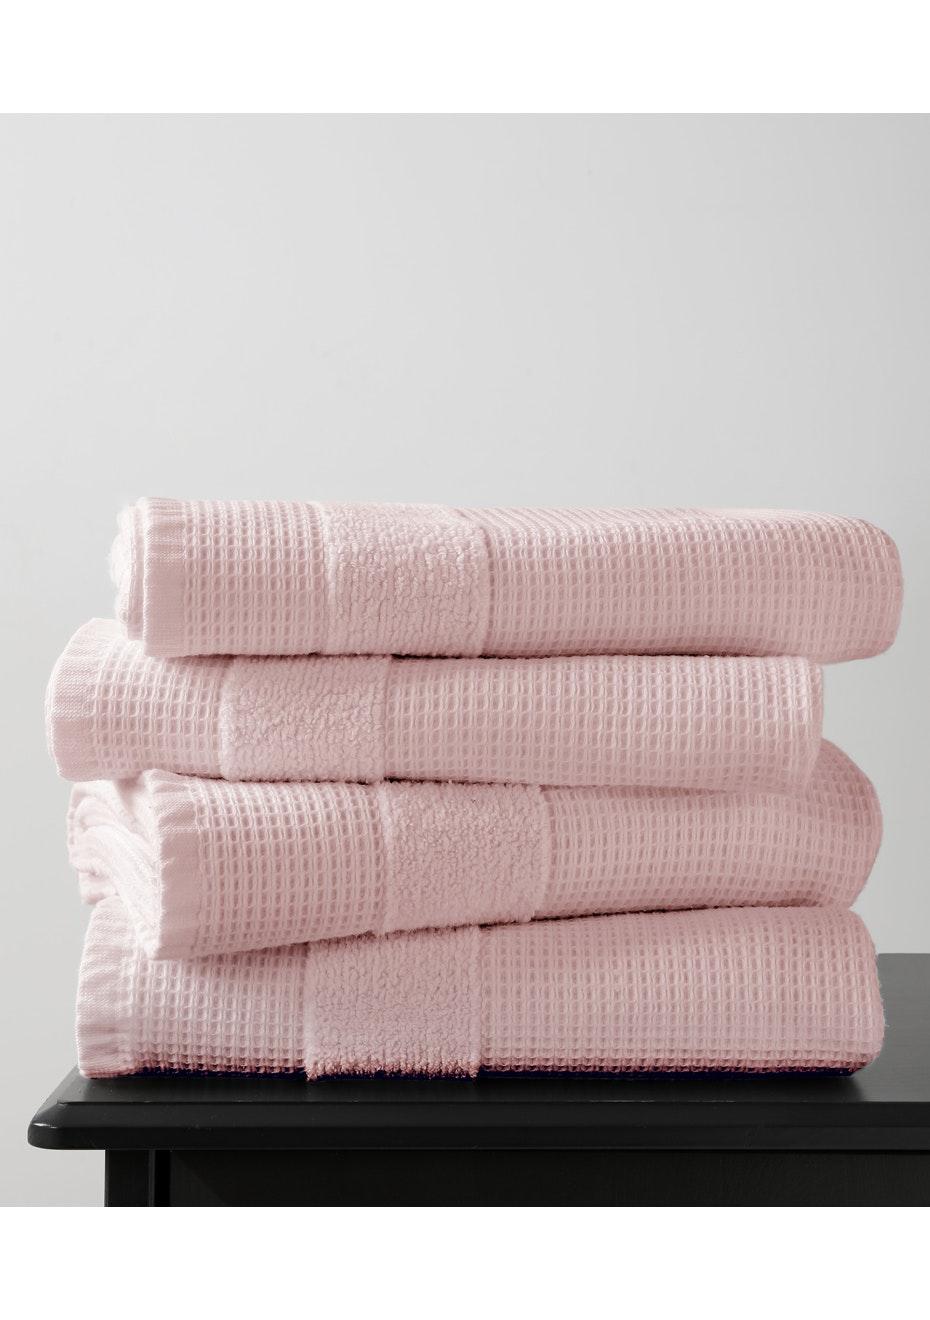 2 Pack Blush 600gsm Waffle Bath Towel